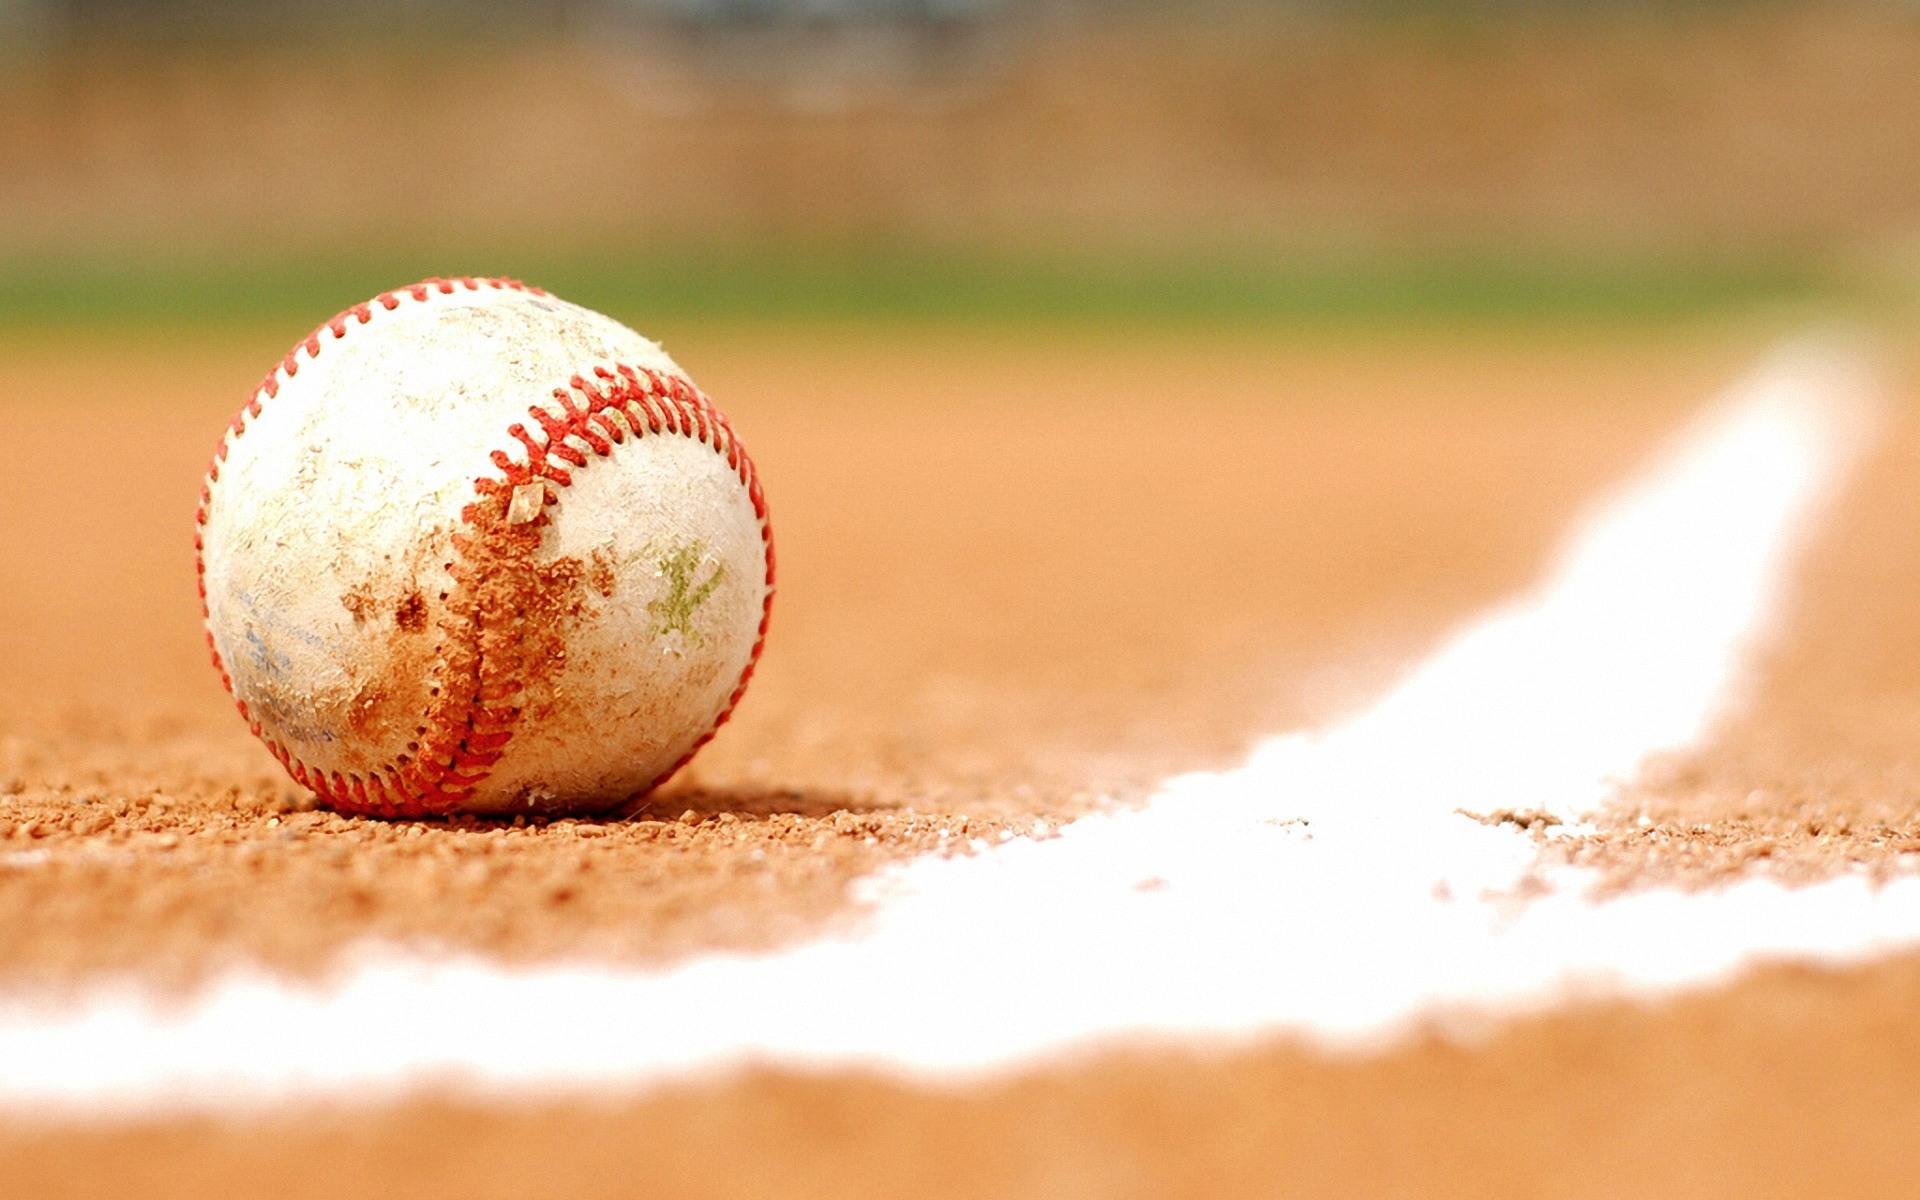 Top Baseball Wallpaper